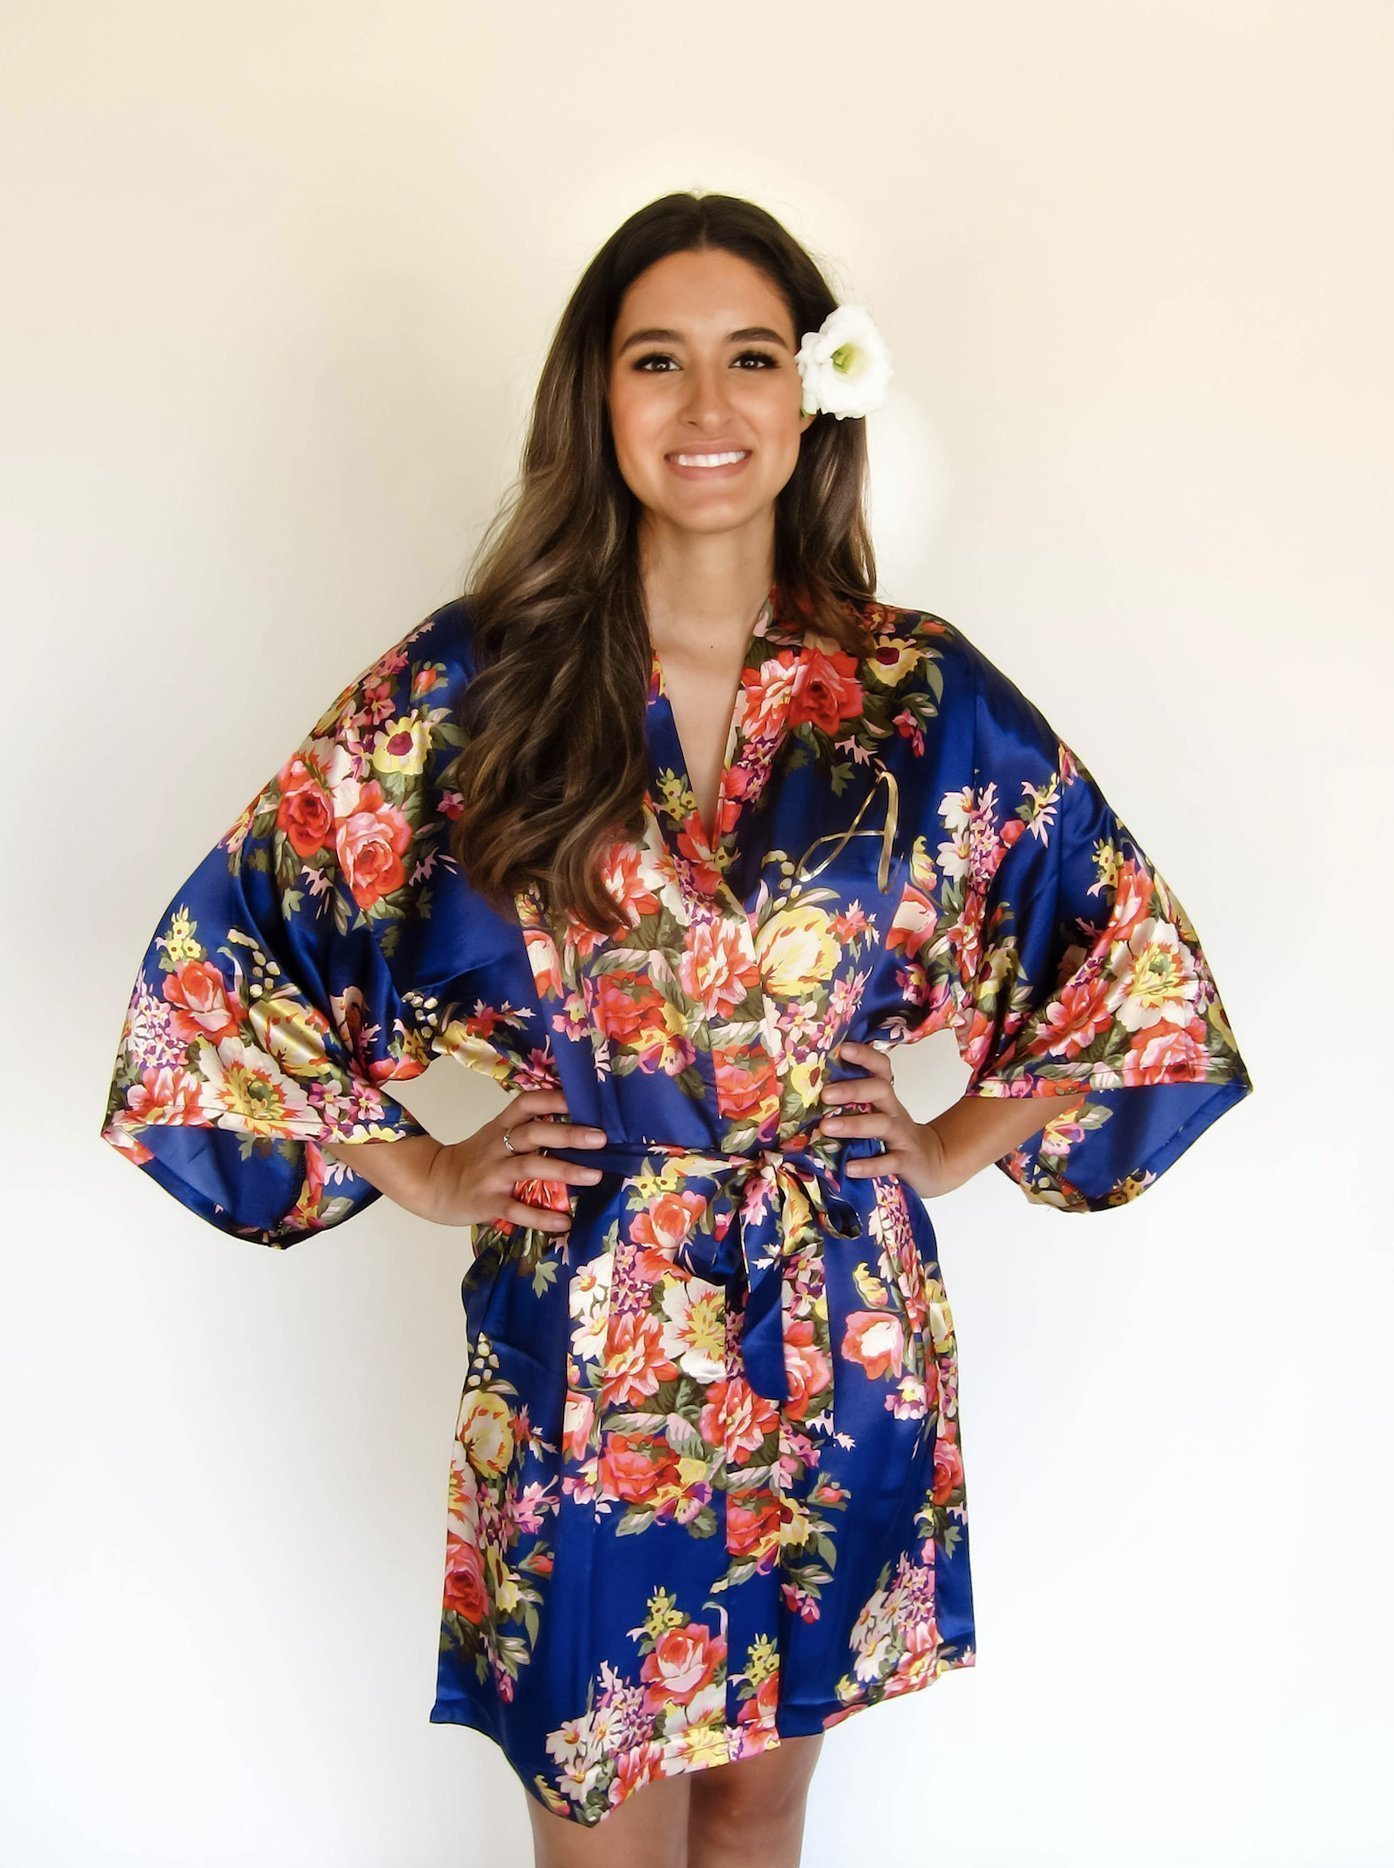 Joy Mabelle Women's Floral Kimono Robe For Bridesmaids, Bride, Mother of the Bride, Mother of the Groom